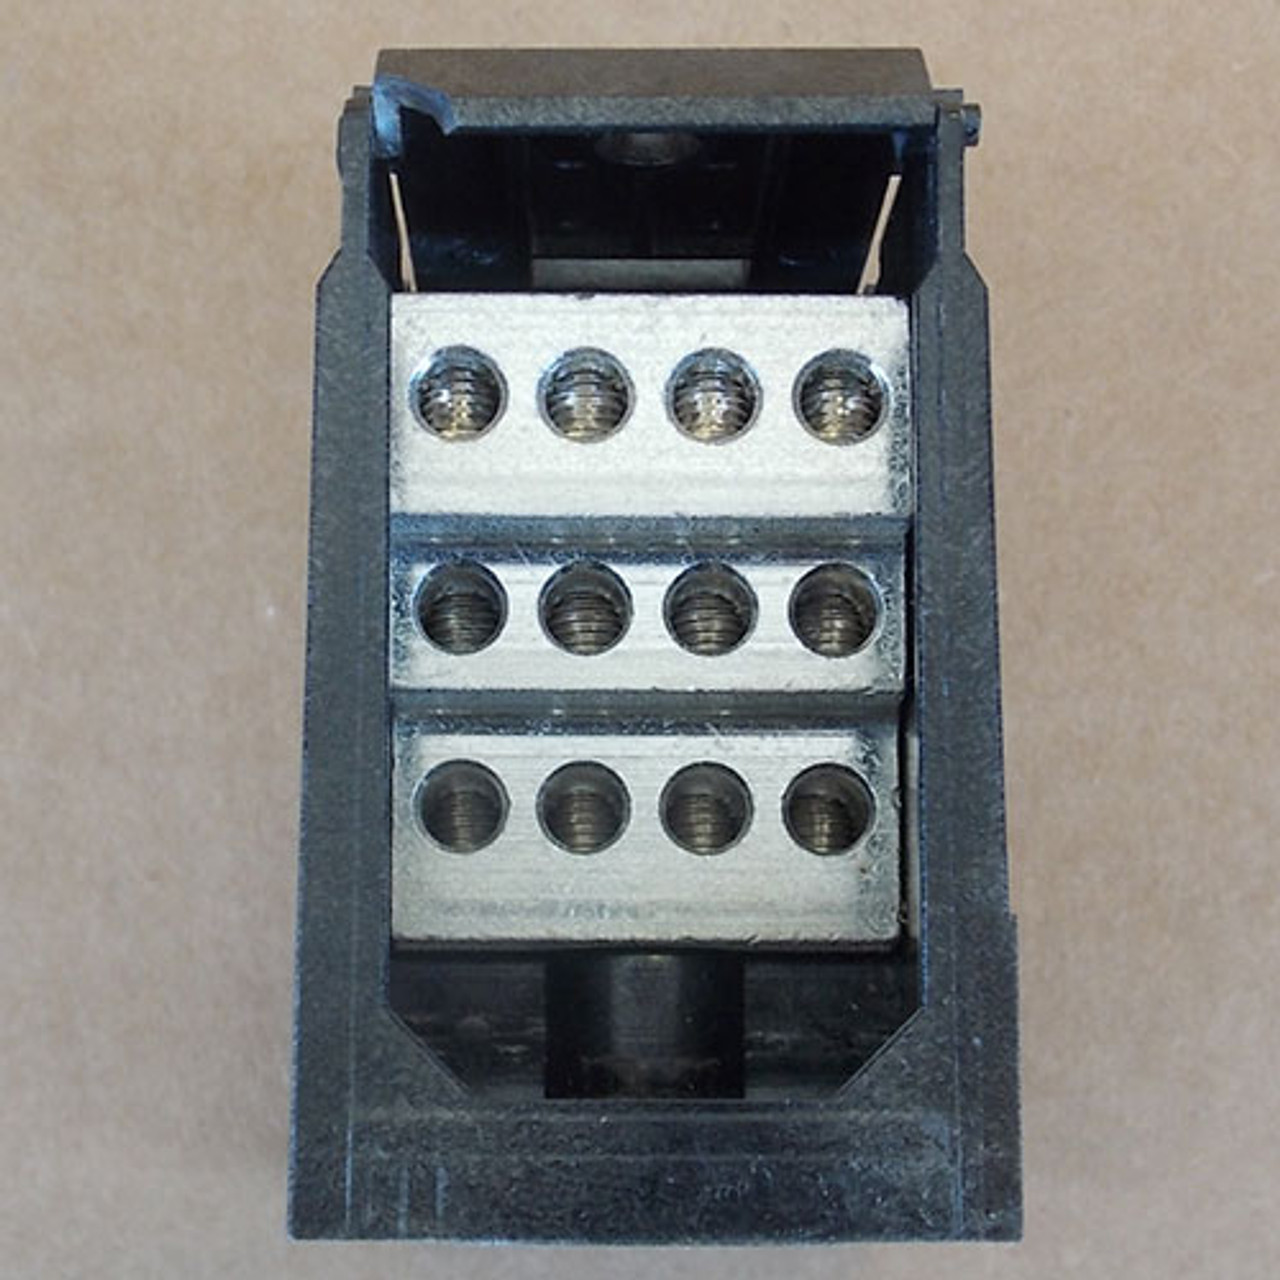 Marathon 1331273CH 1 Pole 510 Amp 600V Power Distribution Block - New